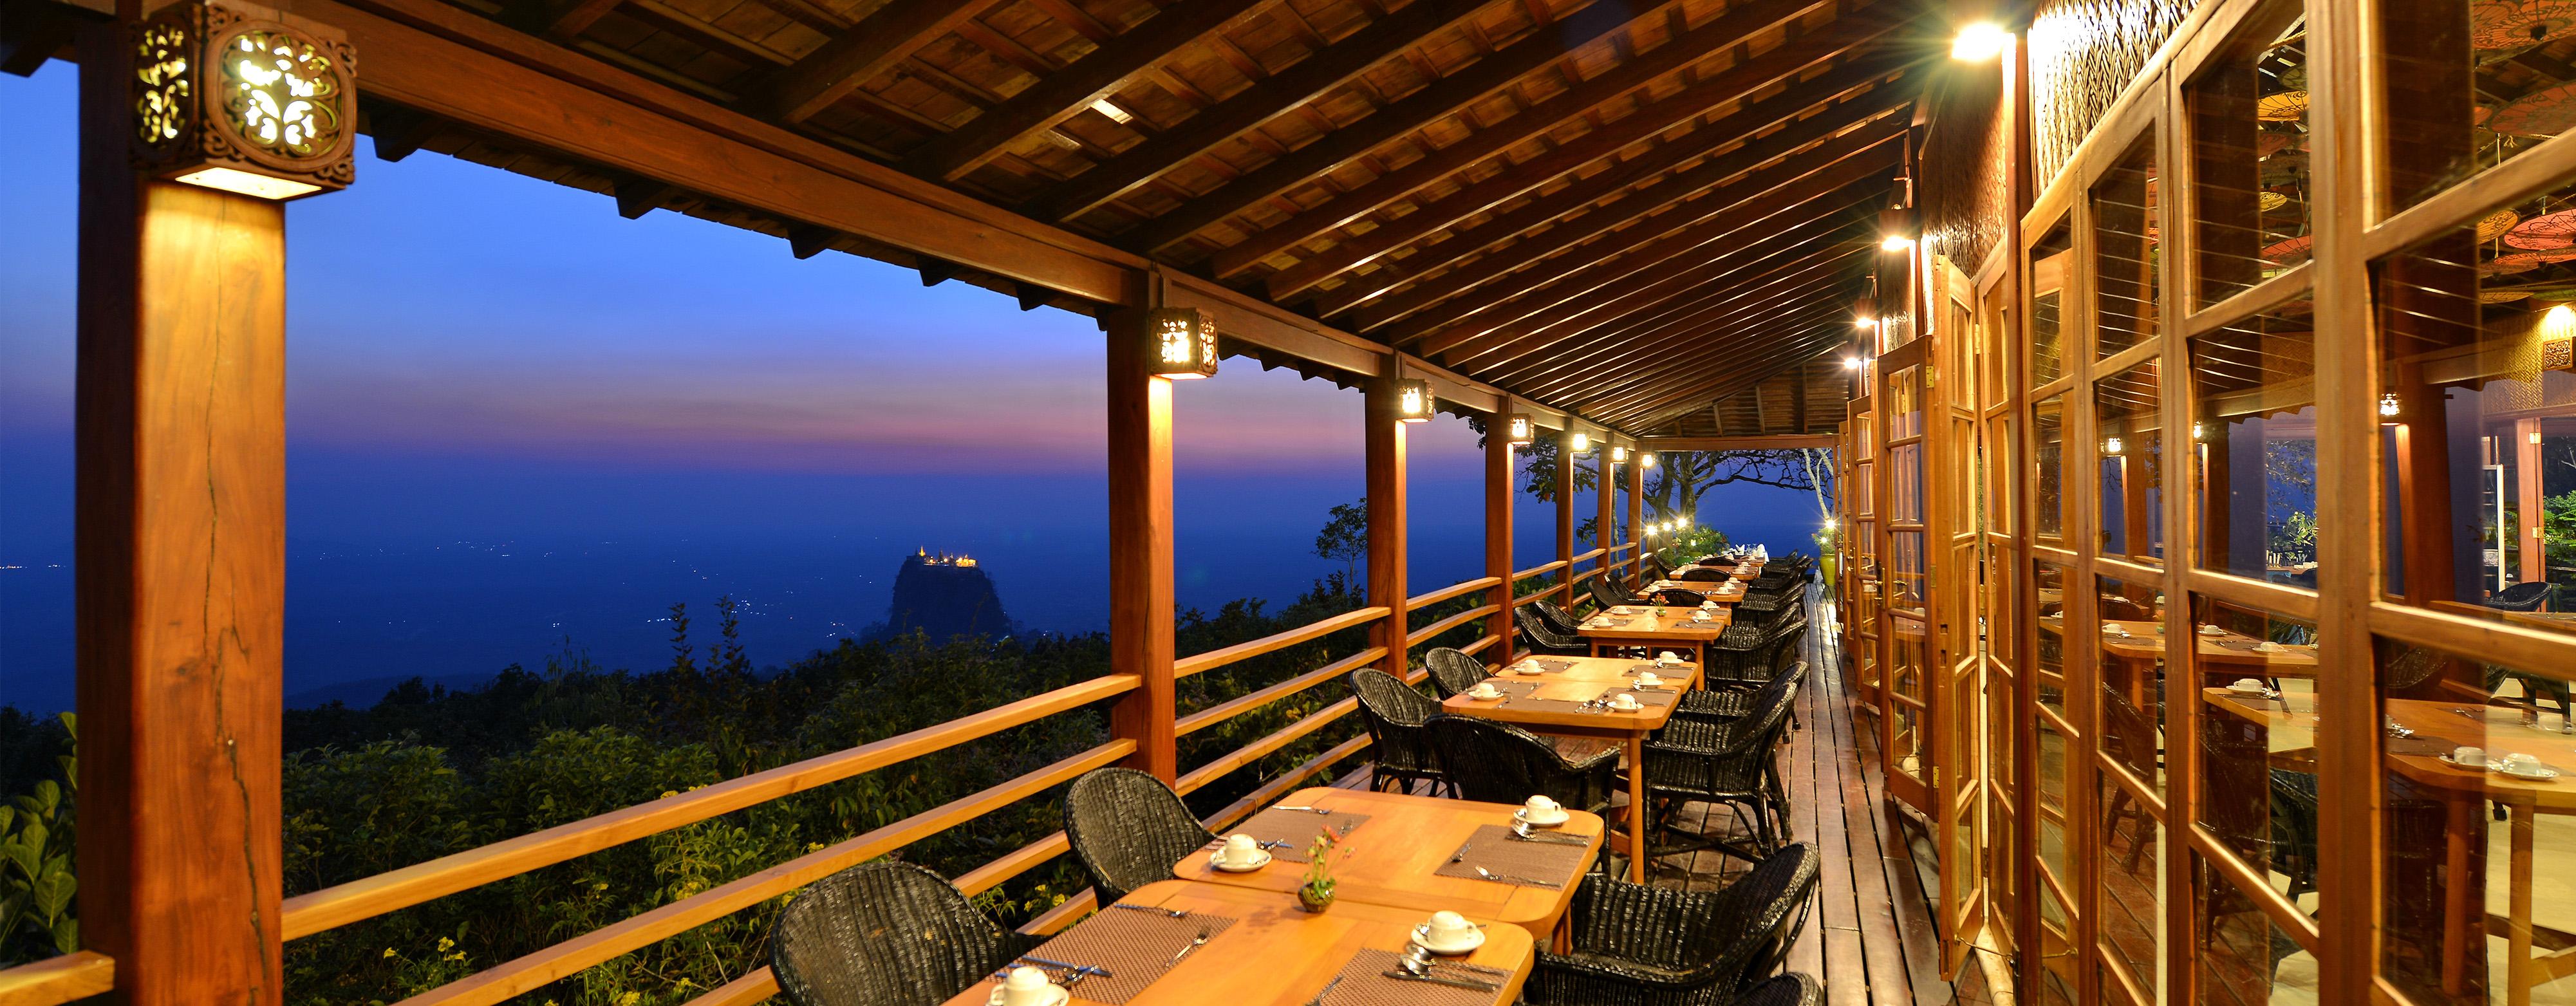 contact us - popa mountain resort